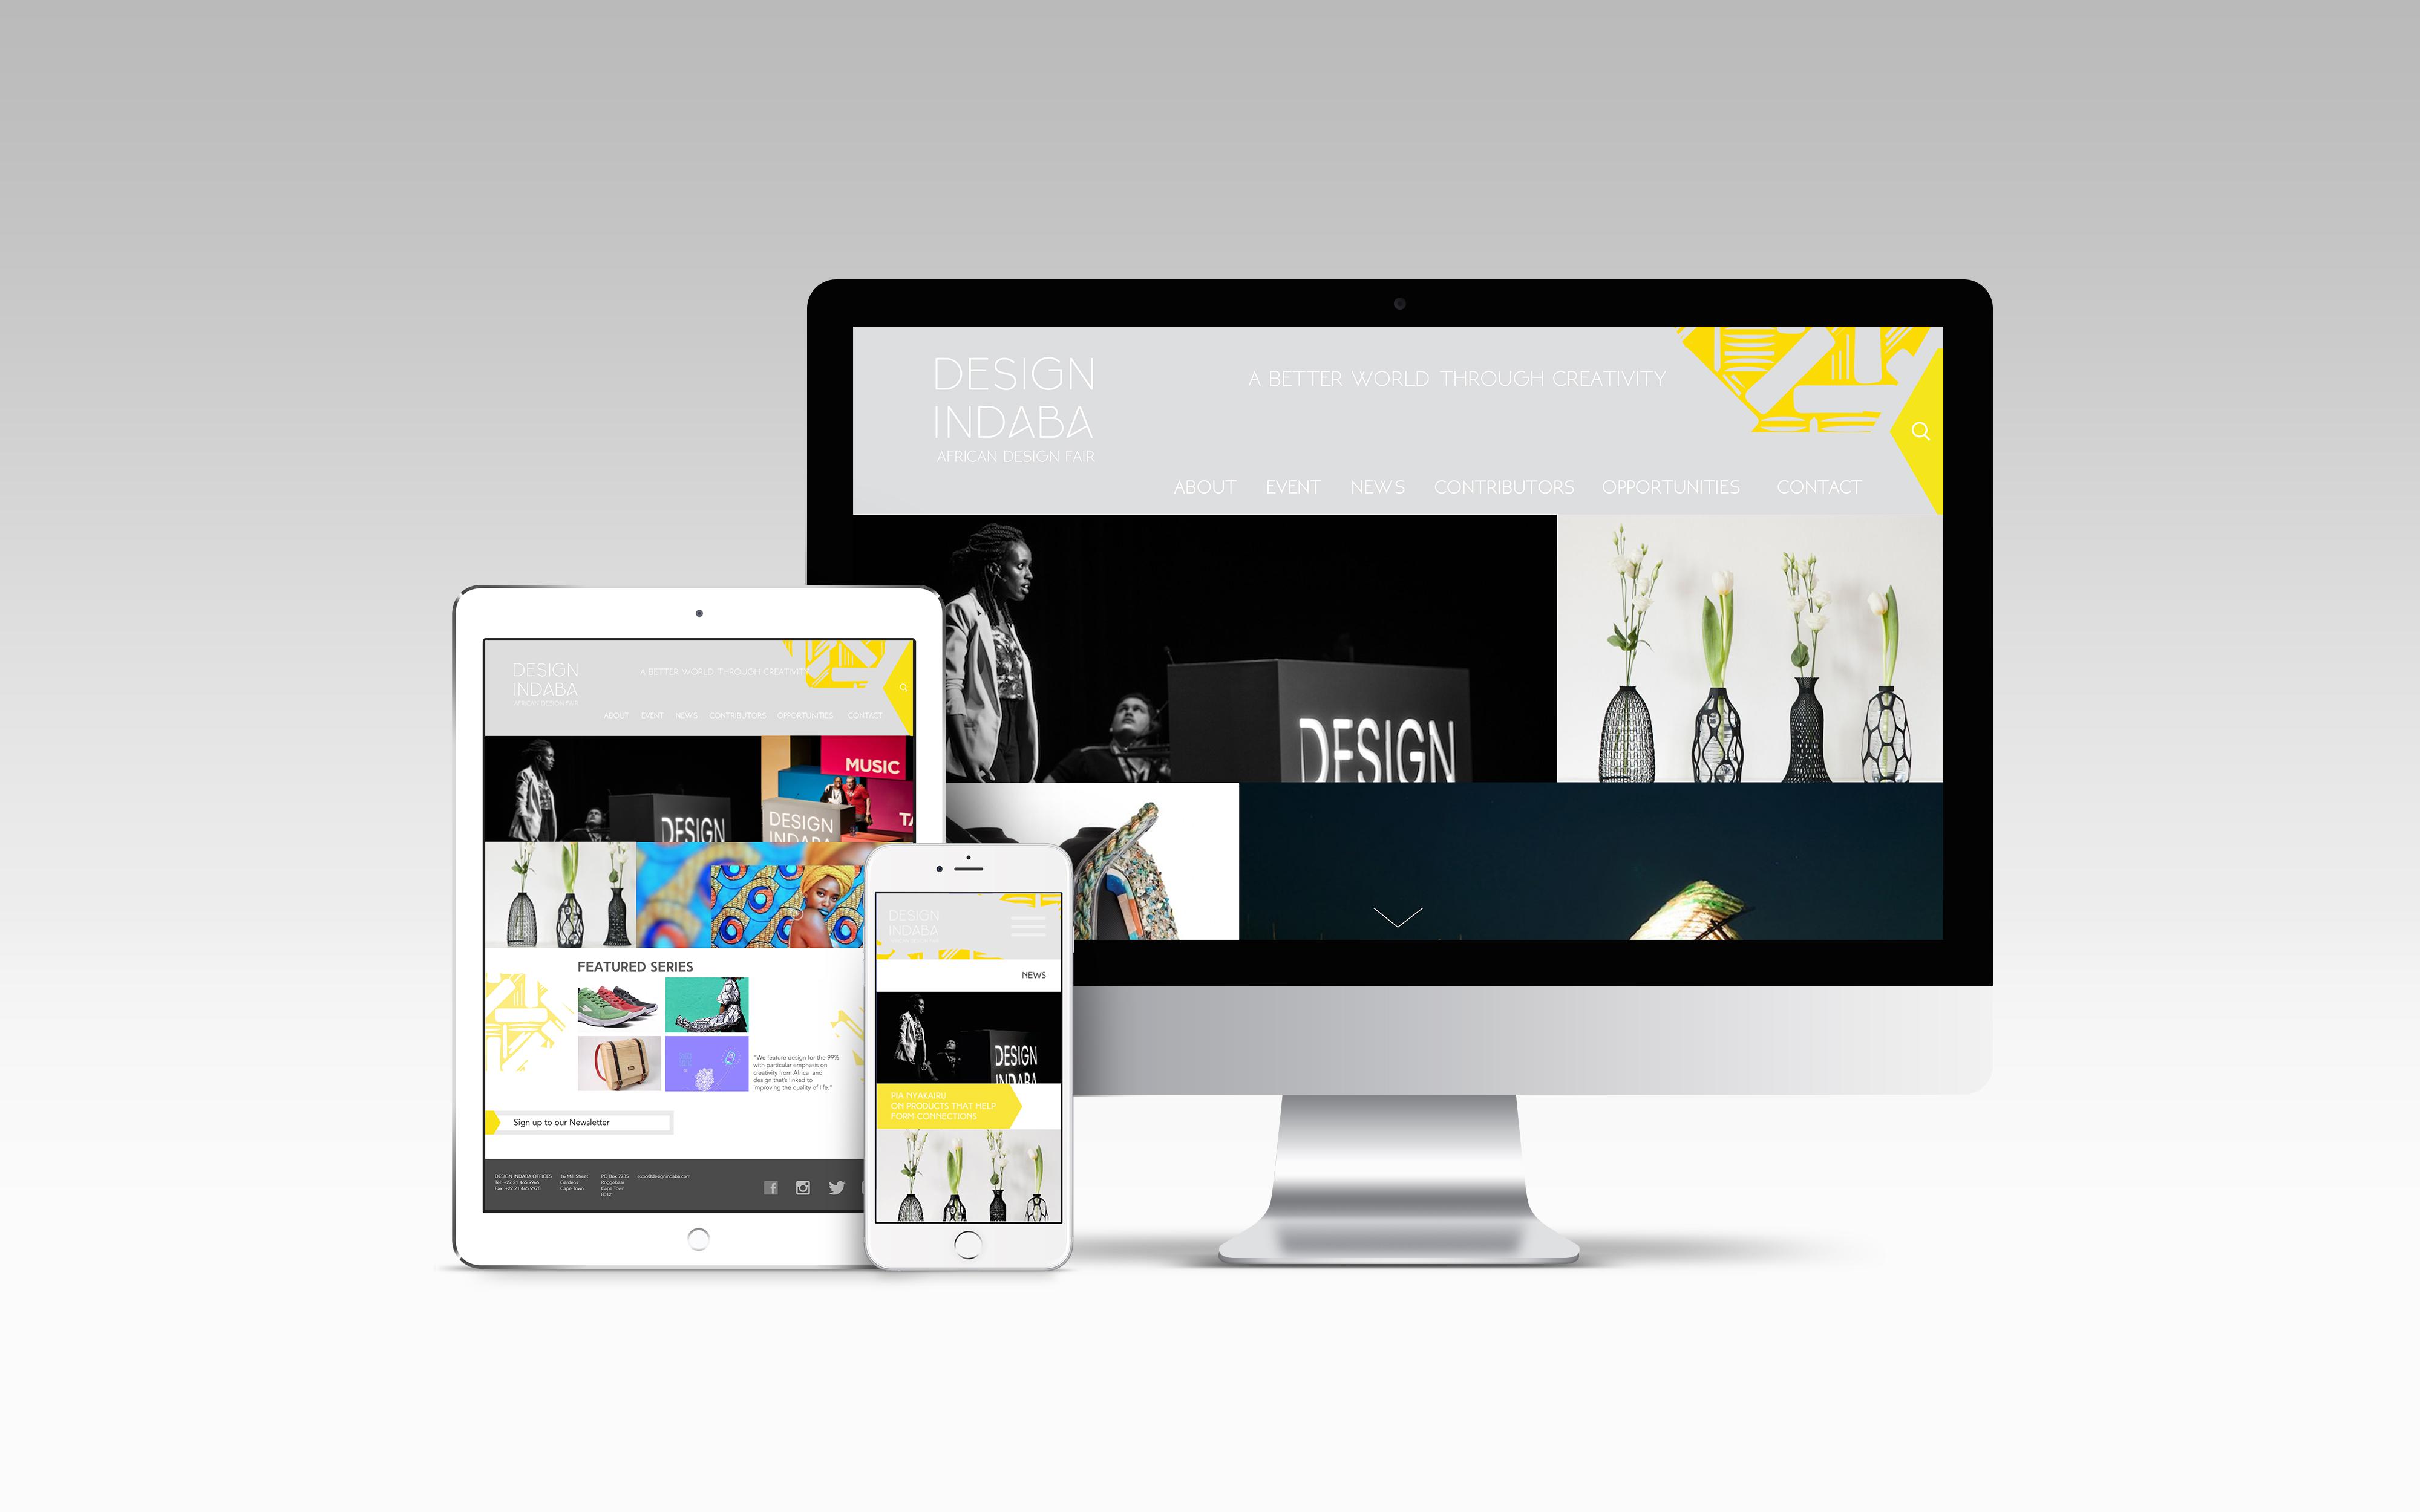 Design Indaba Digital Approach